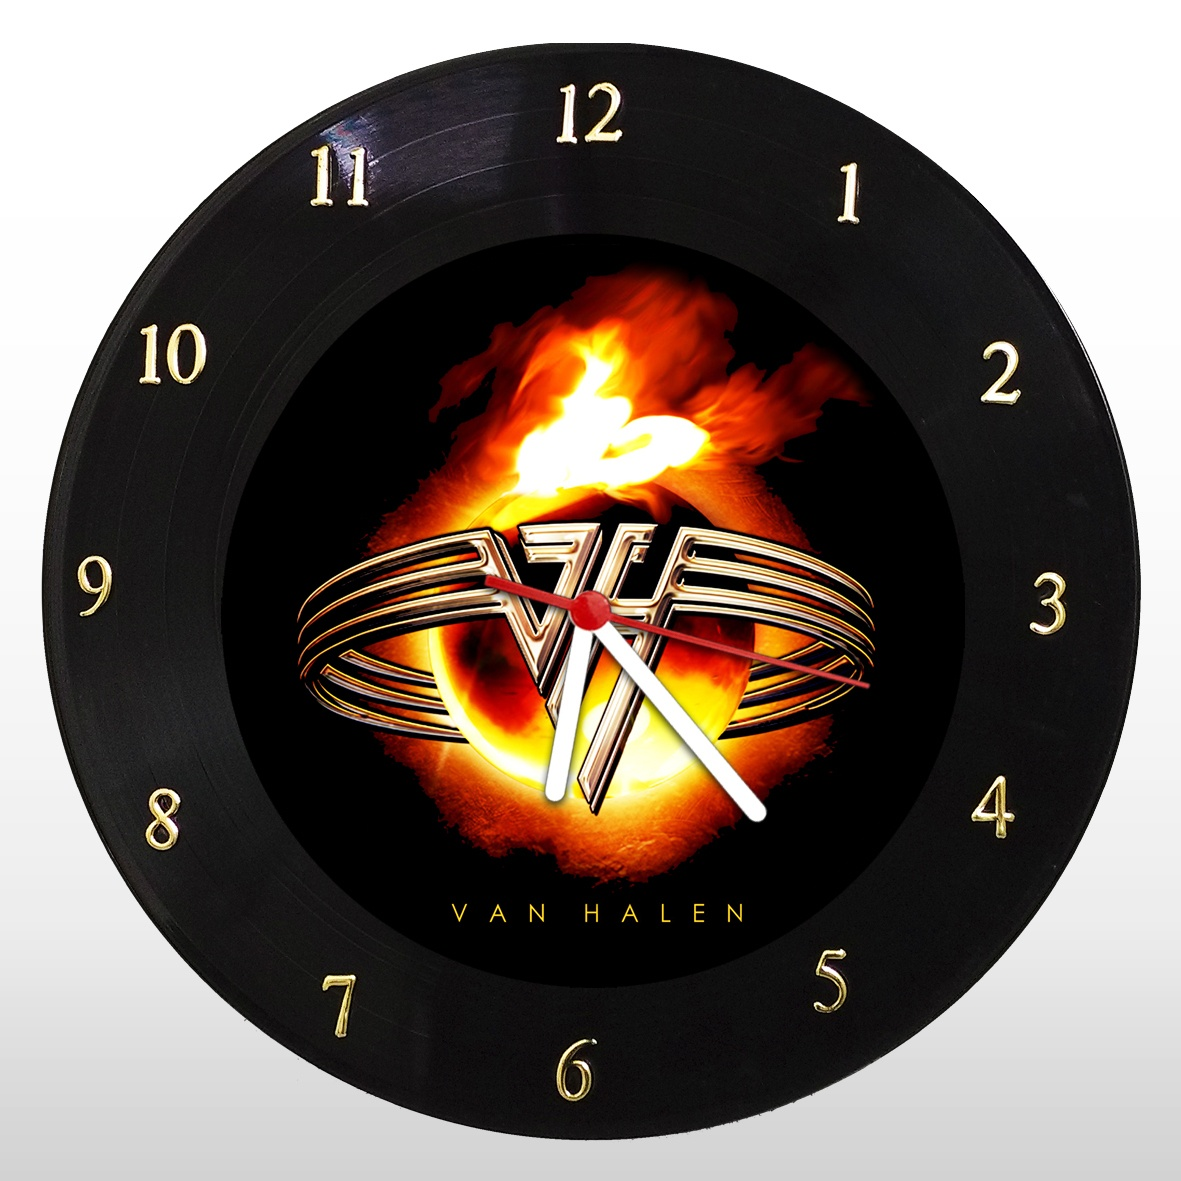 Relógio de Parede em Disco de Vinil Van Halen - Mr. Rock